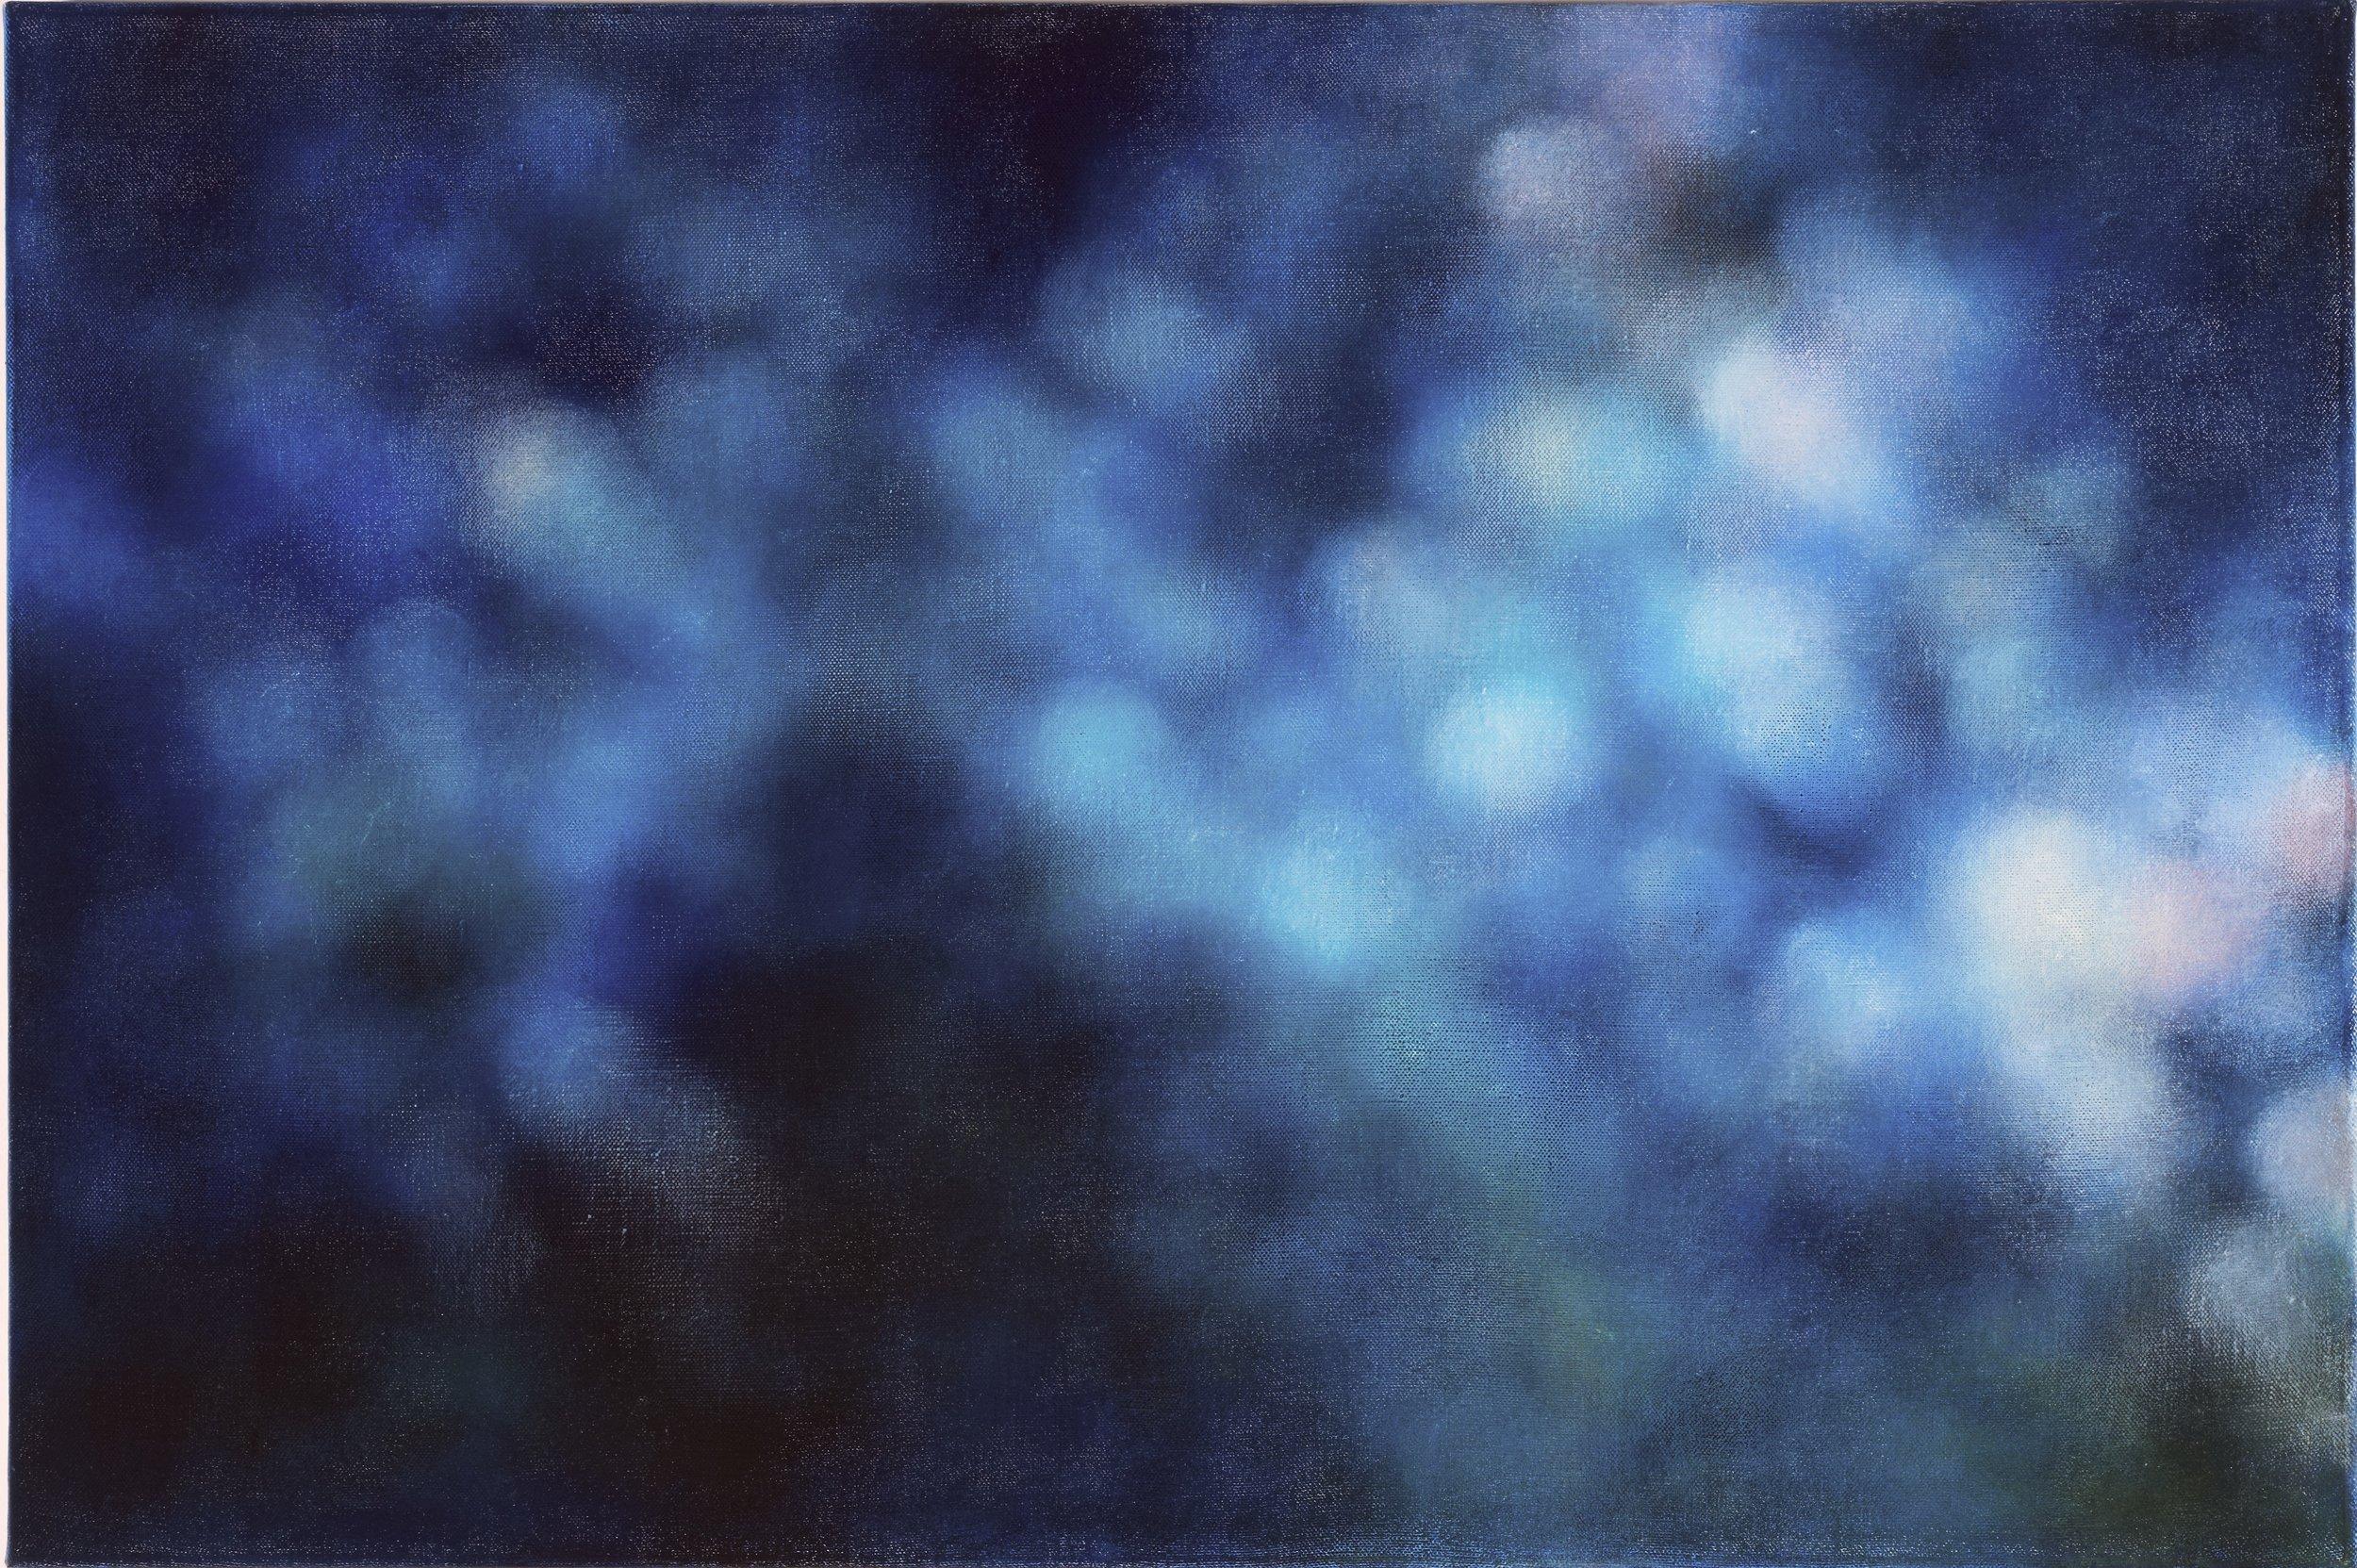 Abstract blue light, 2010, oil on canvas, 92x61cm